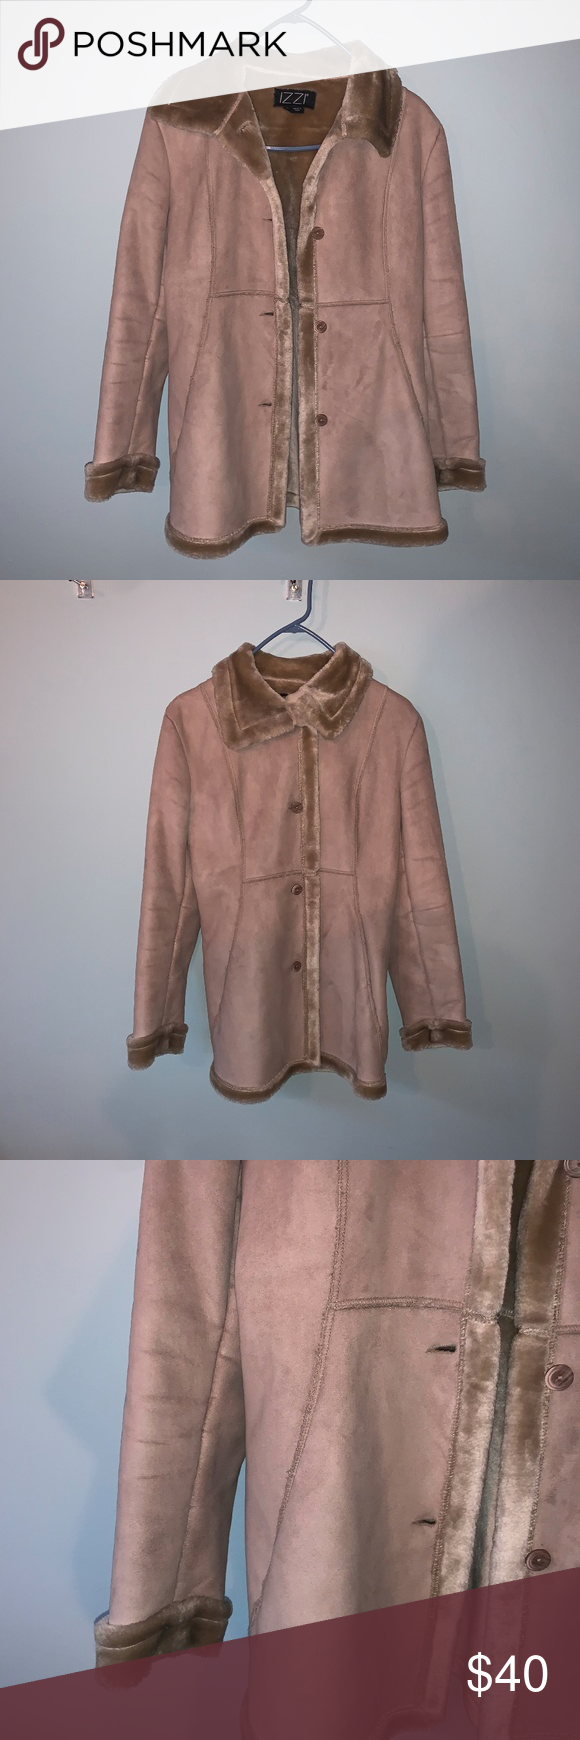 Izzi Small Suede Jacket W Plush Faux Fur Lining Suede Jacket Beige Jacket Jackets [ 1740 x 580 Pixel ]